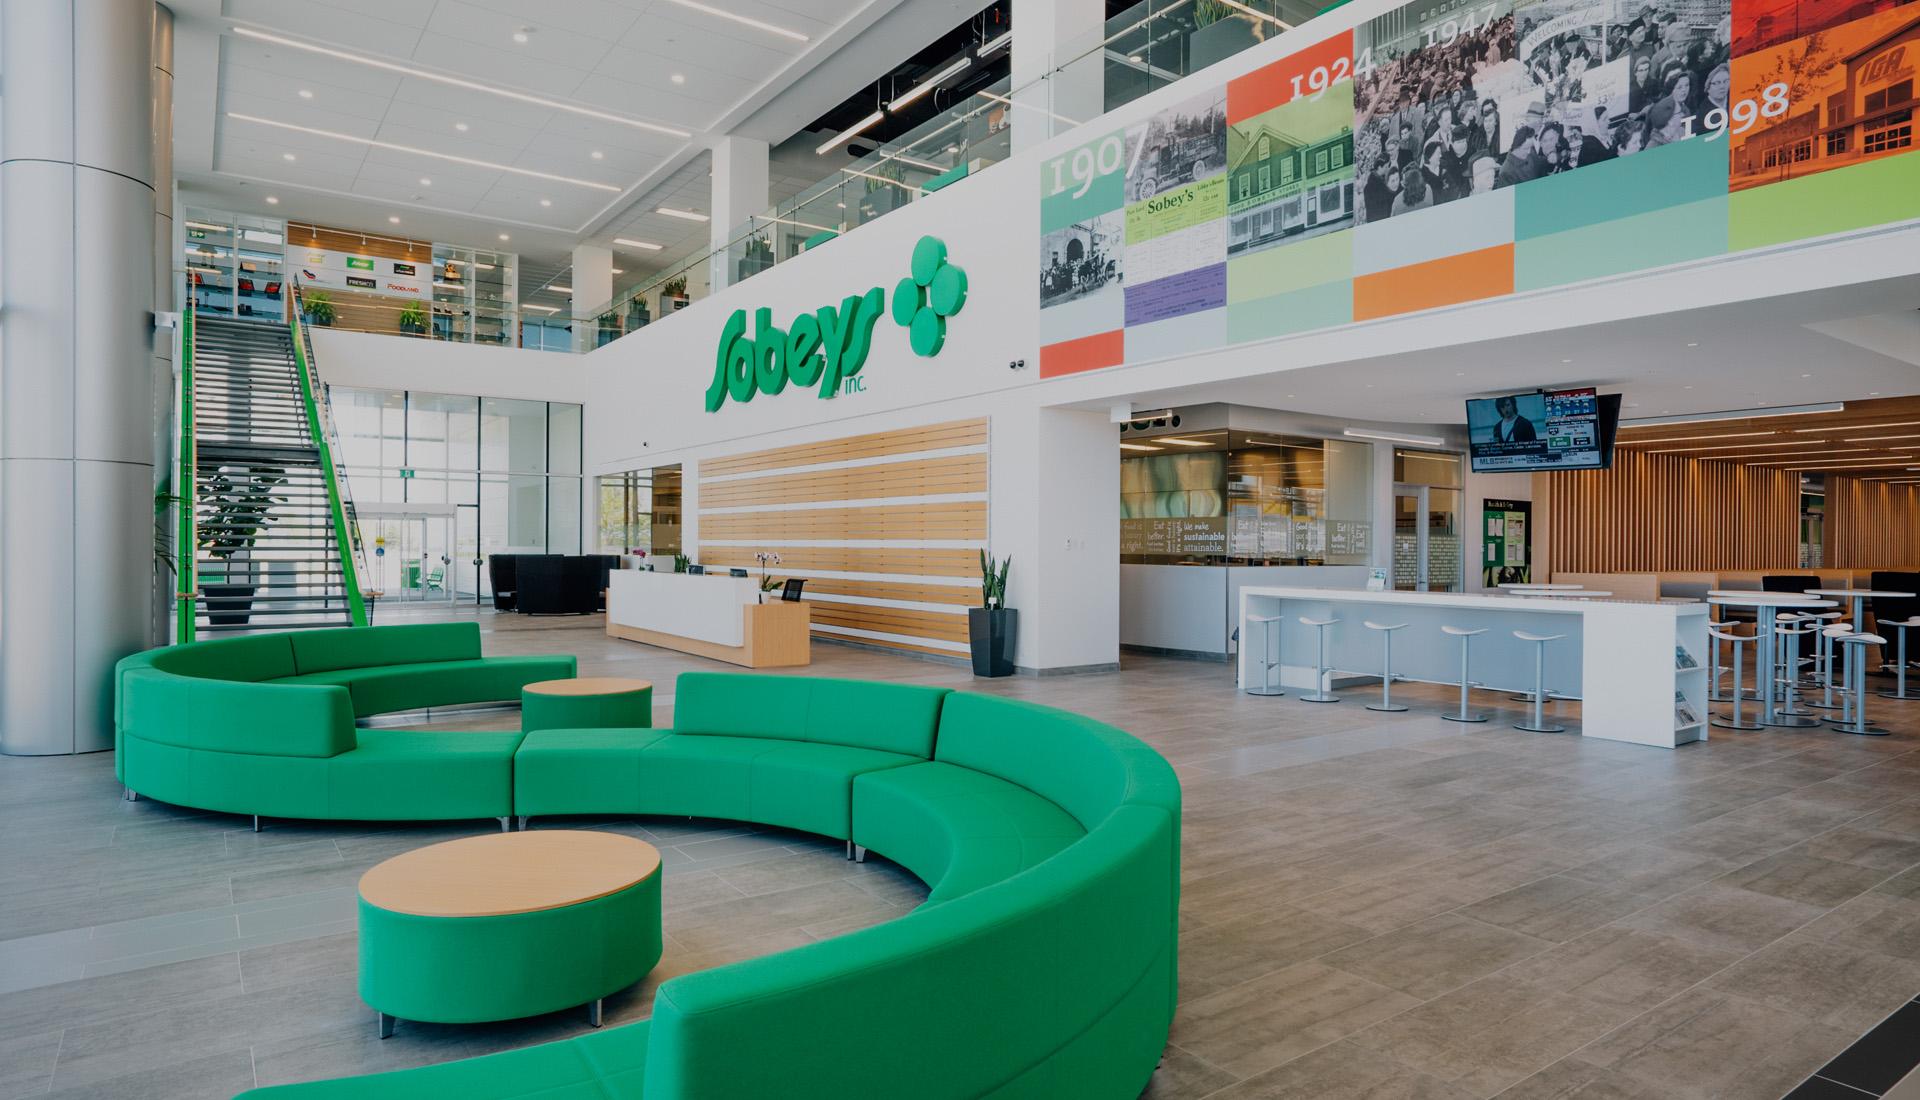 Commercial Interior Design Firm Toronto, Vancouver, Halifax